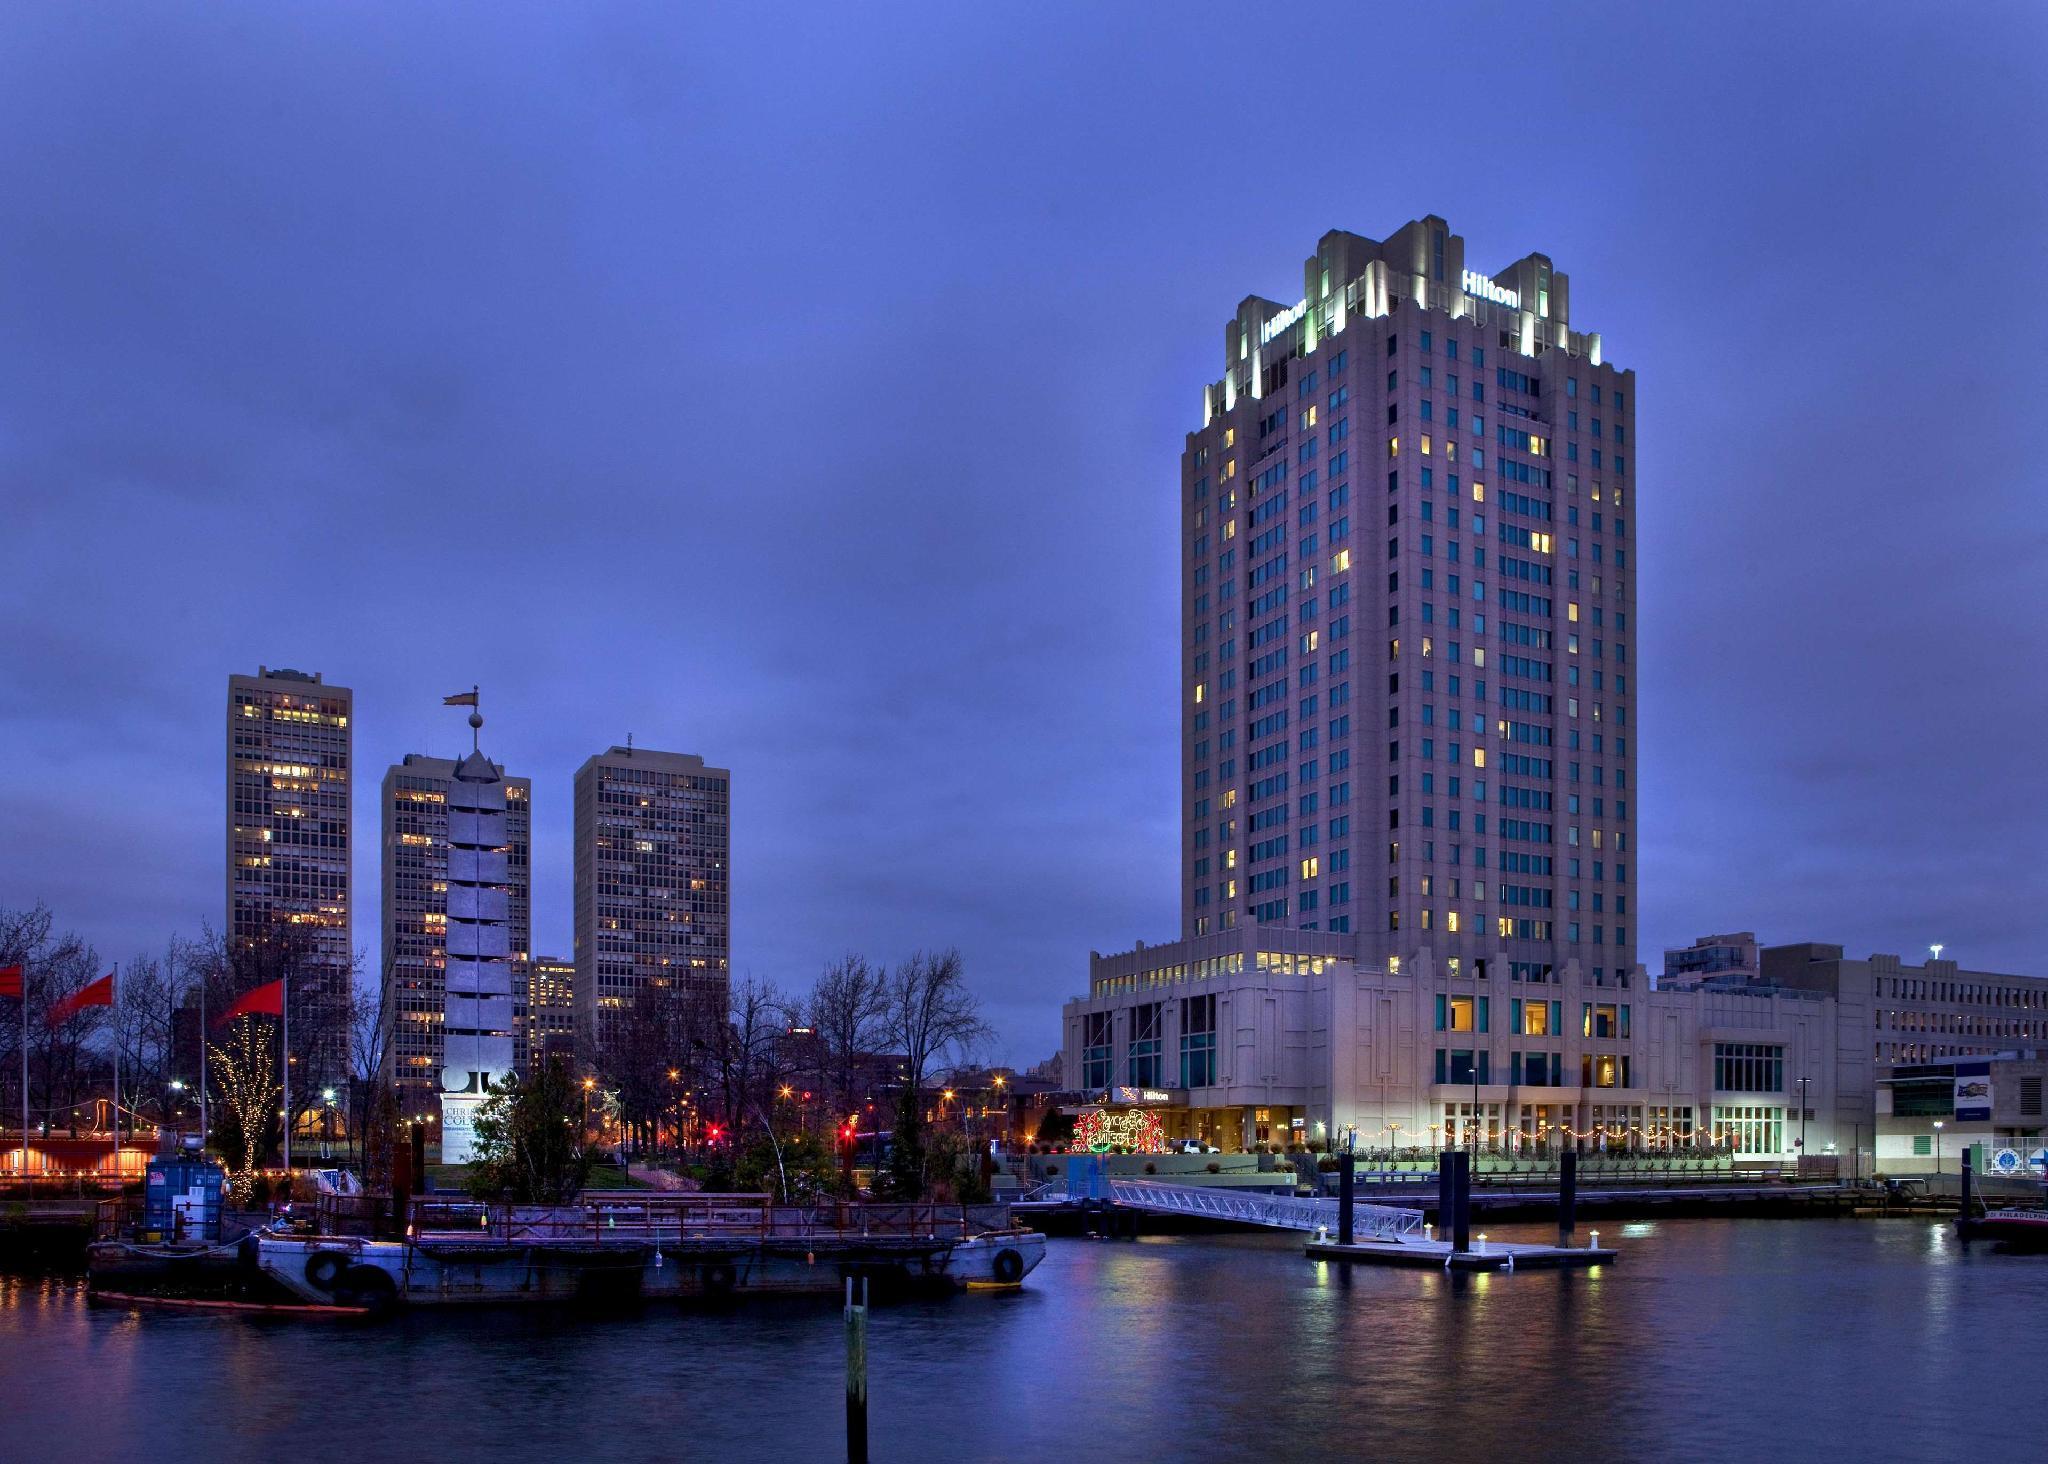 Hilton Philadelphia At Penns Landing